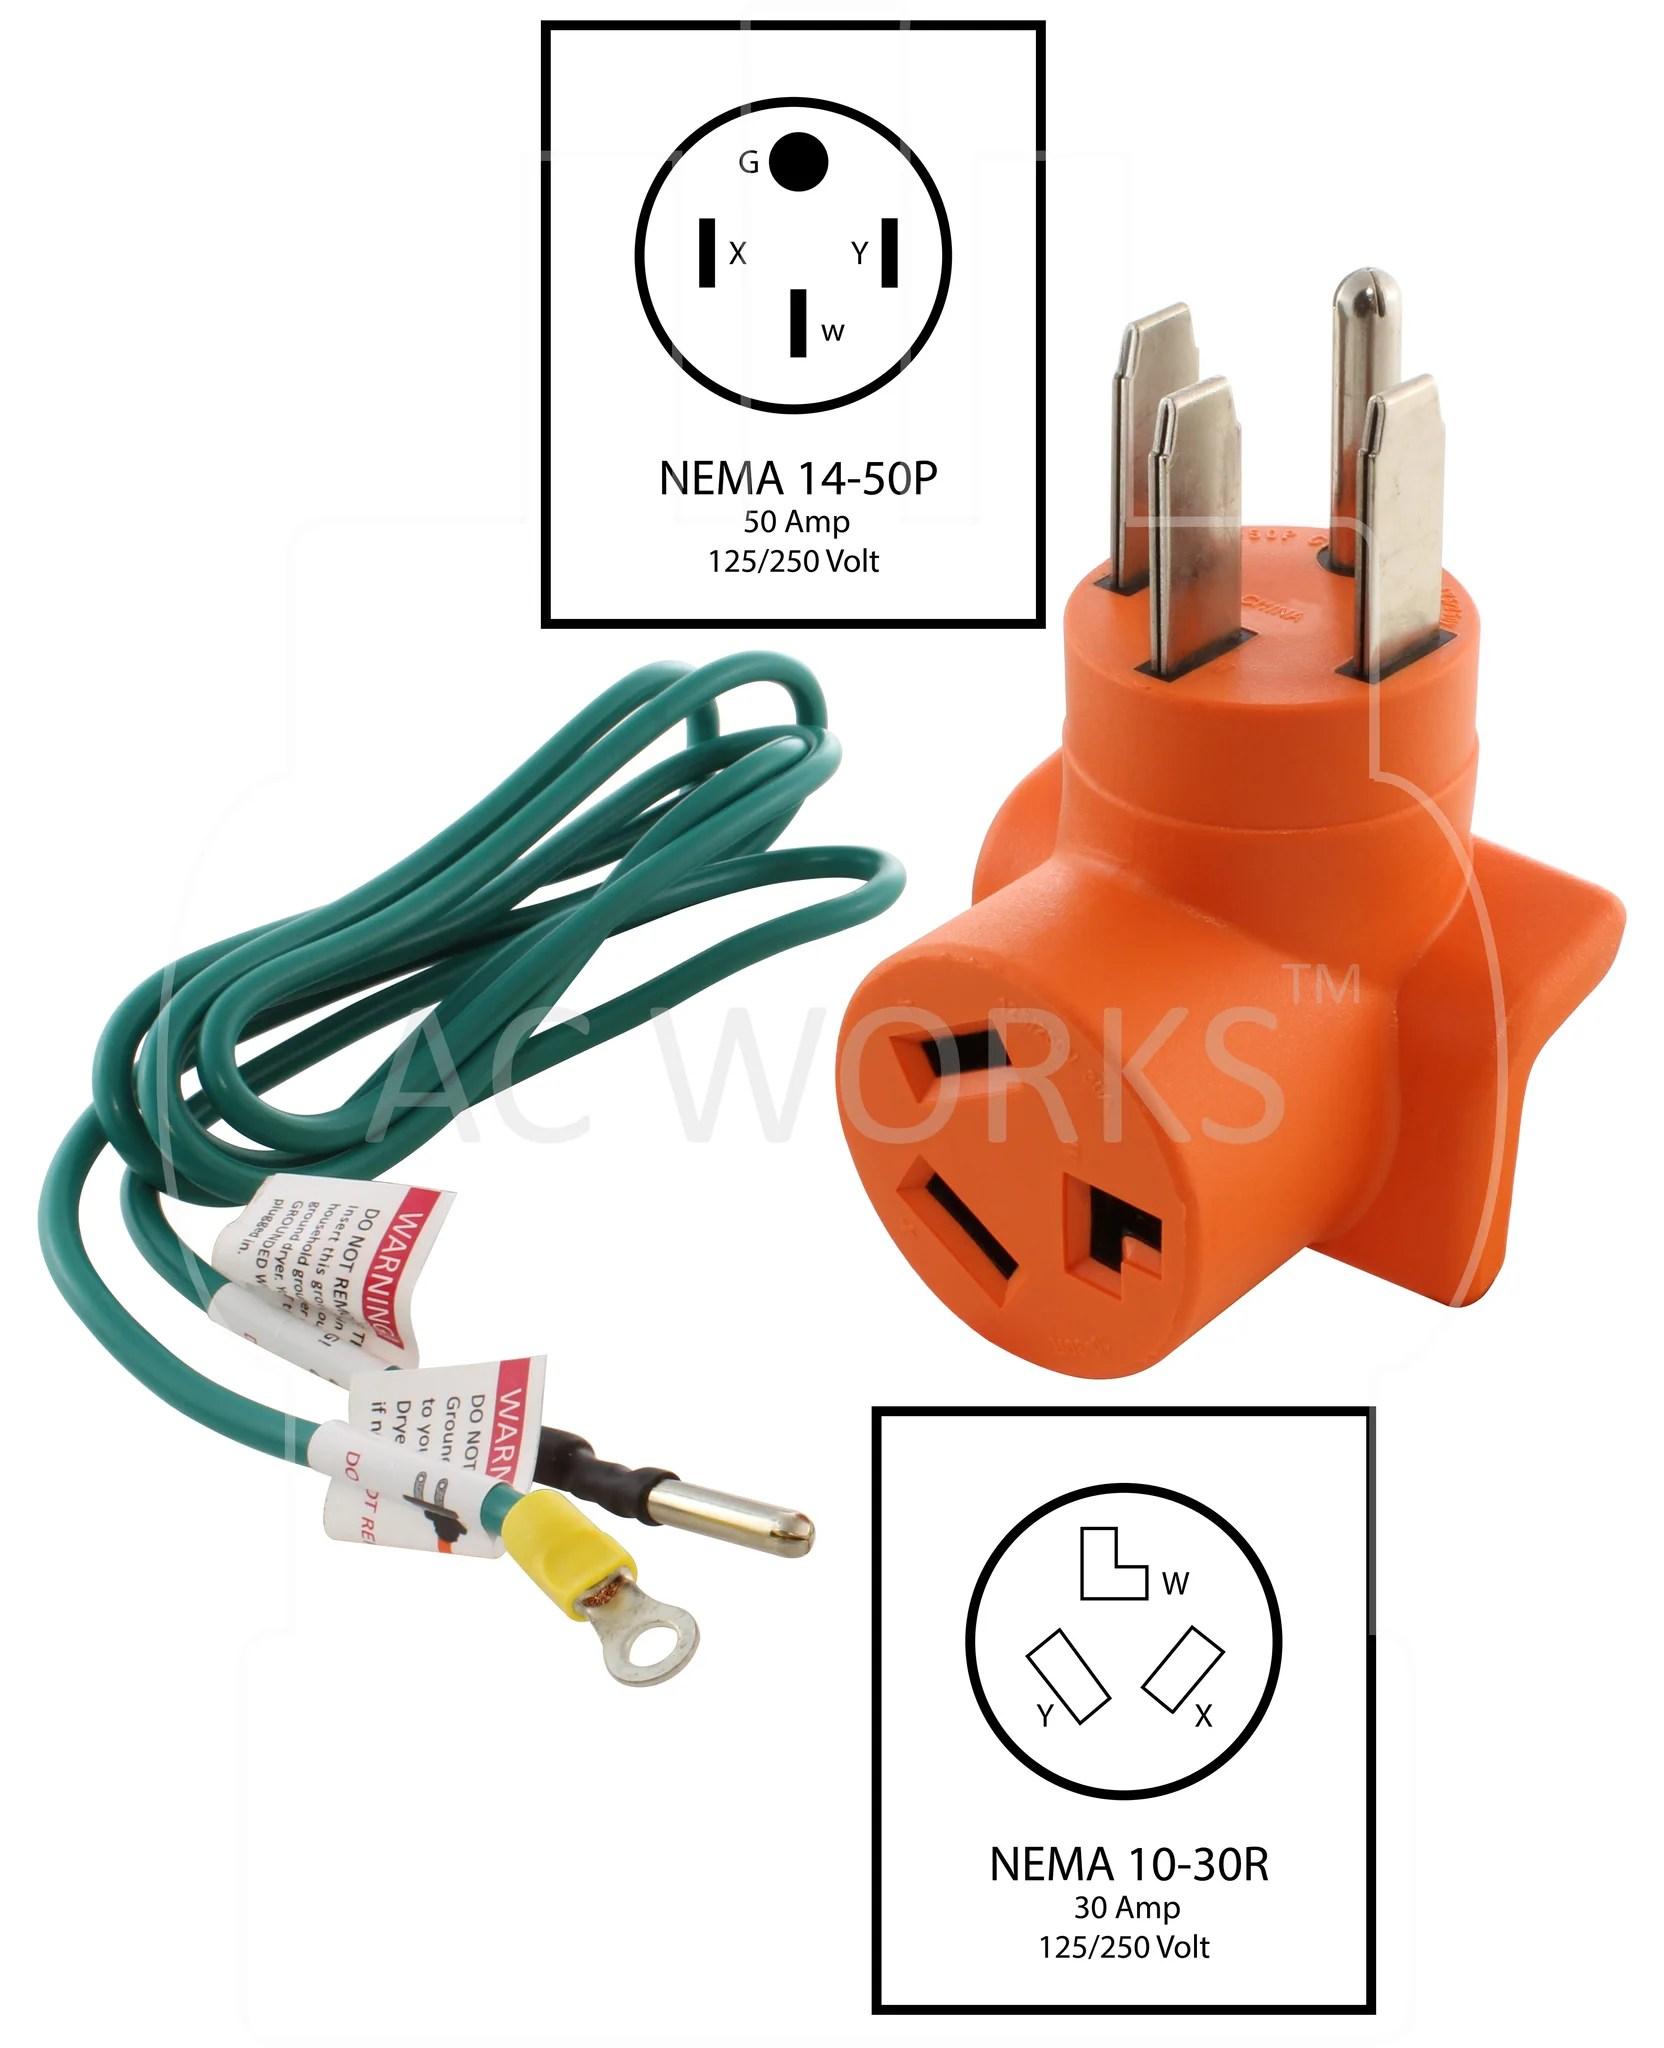 small resolution of  nema 14 50p to nema 10 30r 1450 to 1030 range outlet